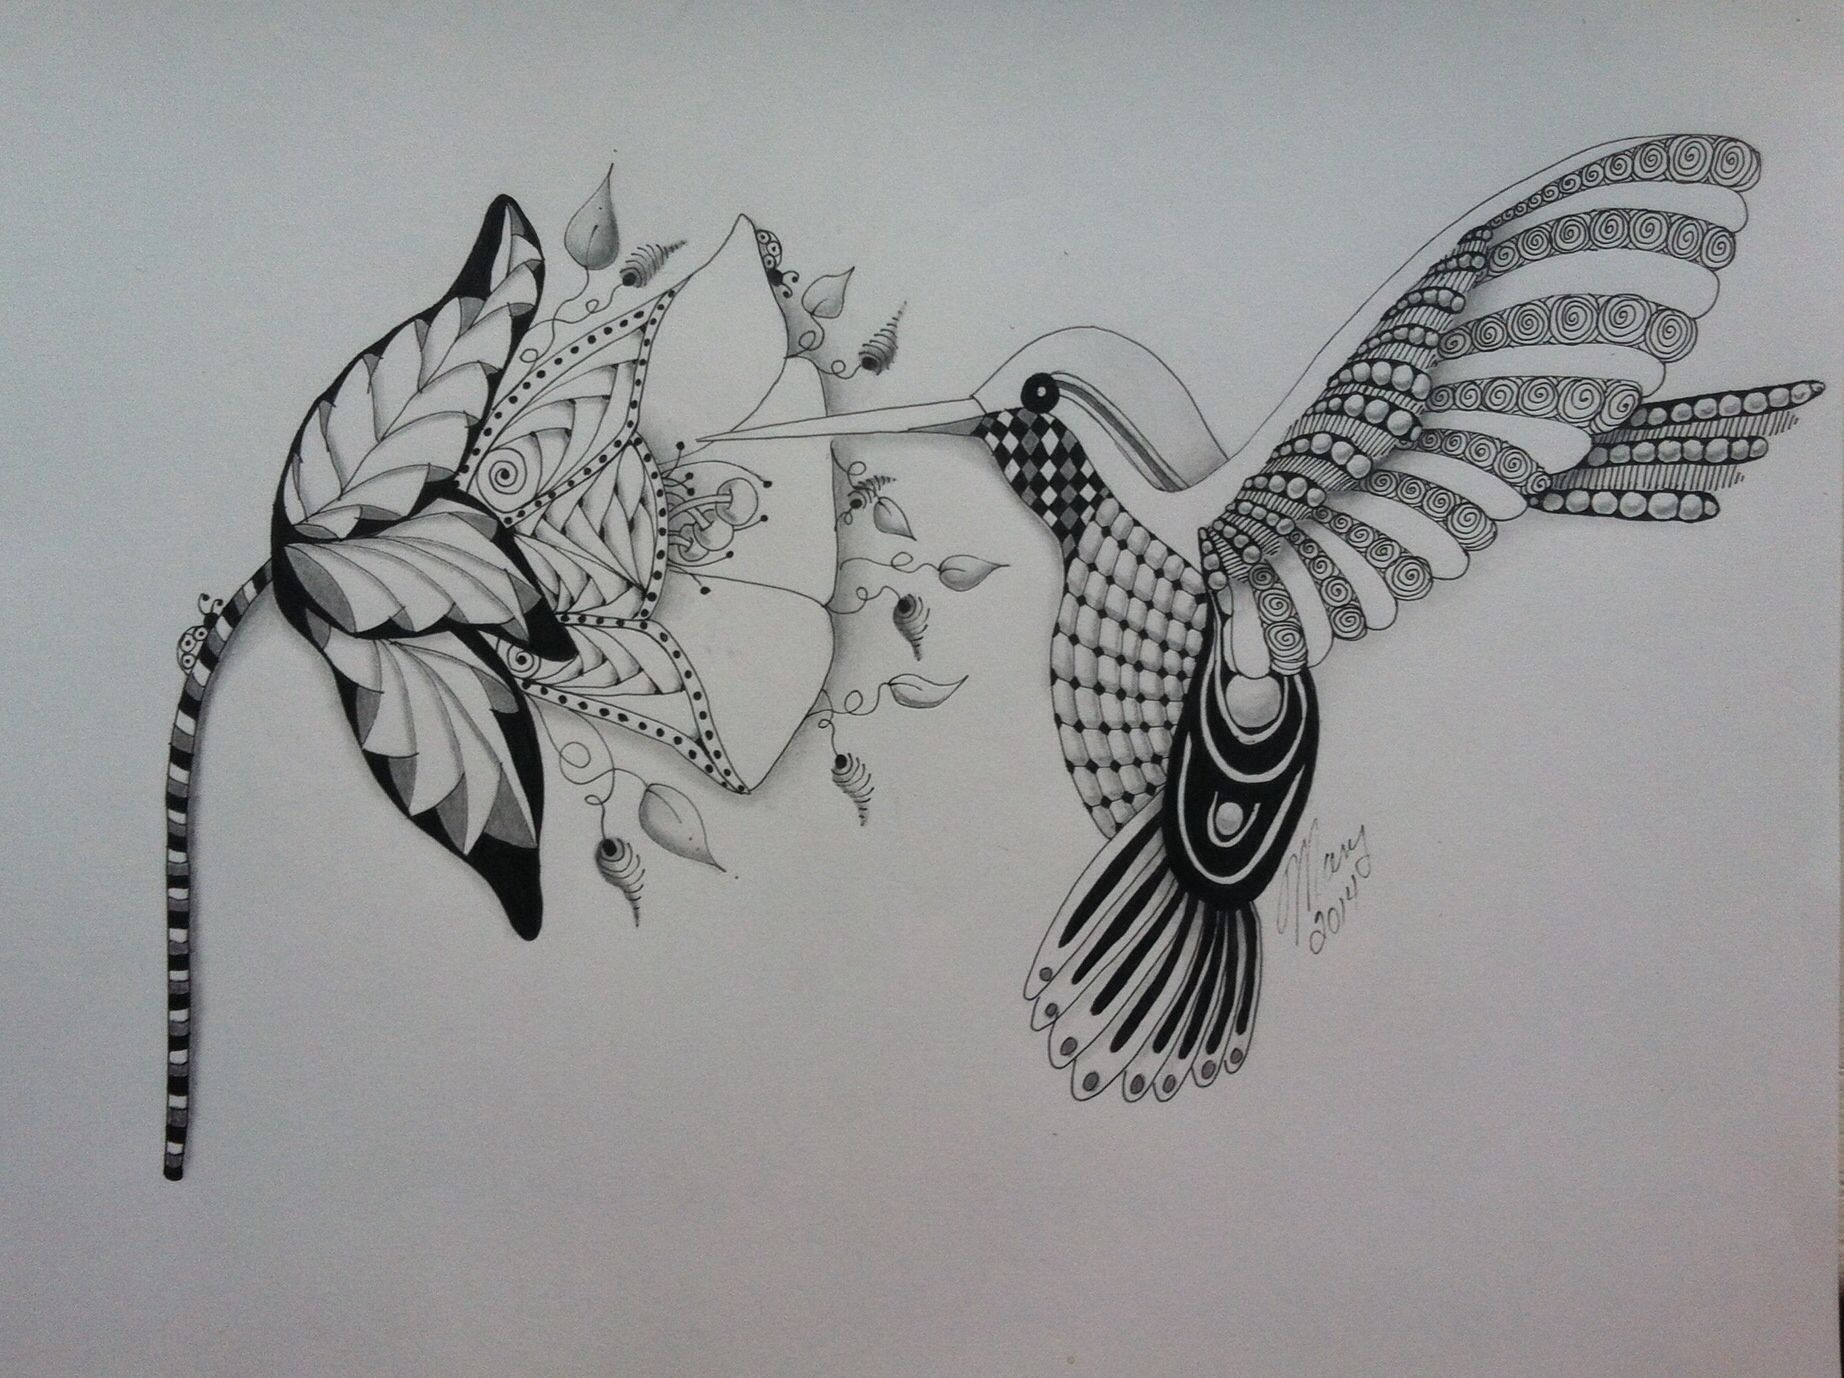 Vogel Malvorlagen Jepang - tiffanylovesbooks.com